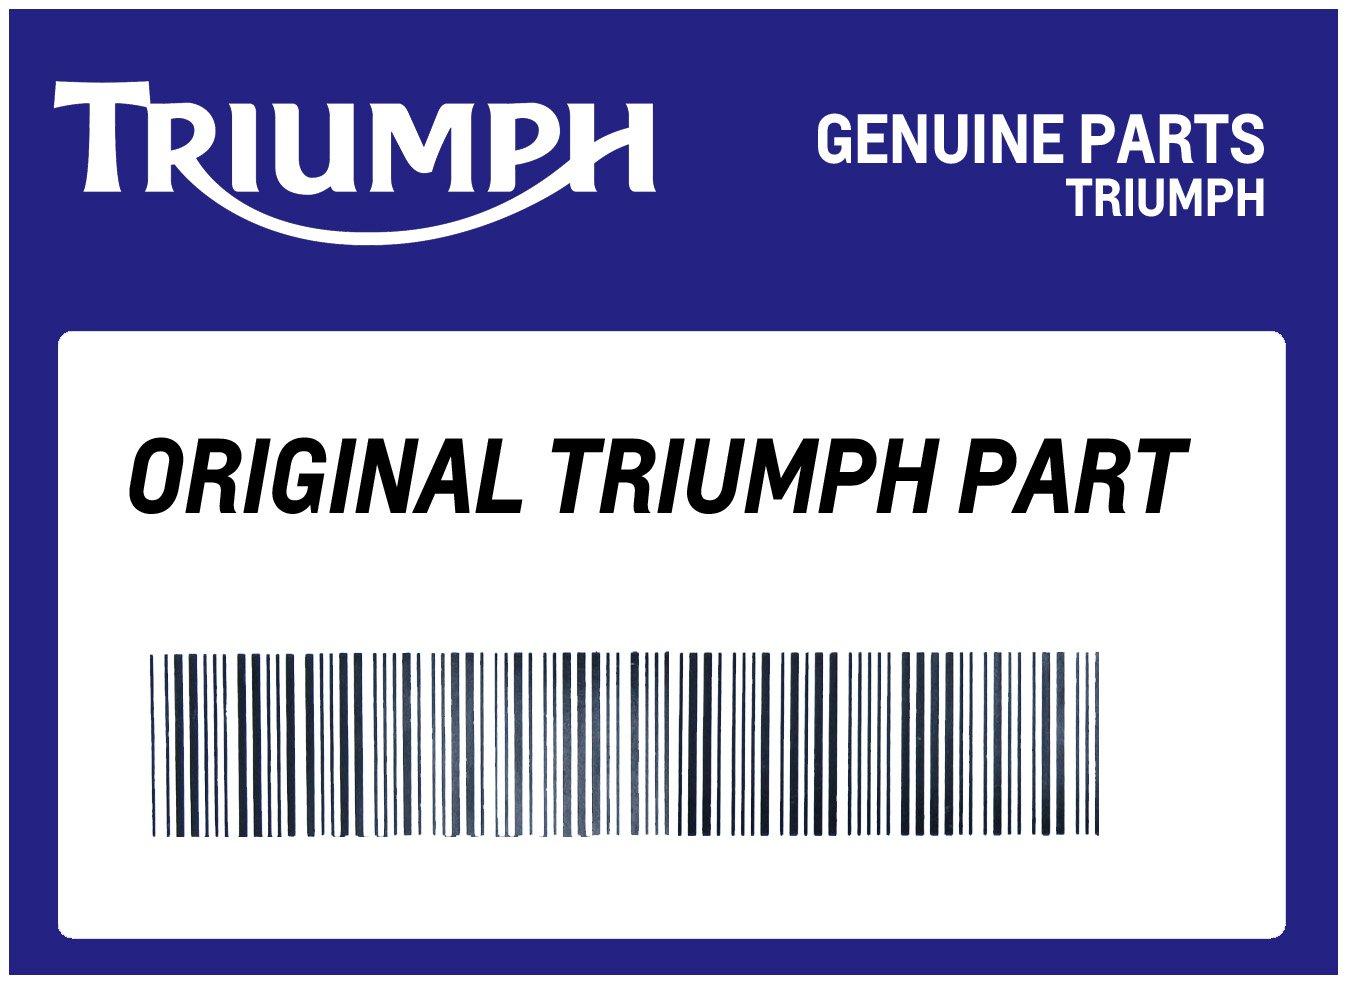 GENUINE TRIUMPH SPIN ON OIL FILTER FITS BONNEVILLE T100,AMERICA,SCRAMBLER,SPEEDMASTER,THRUXTON,800 /& 865 MODELS 2000 ONWARDS